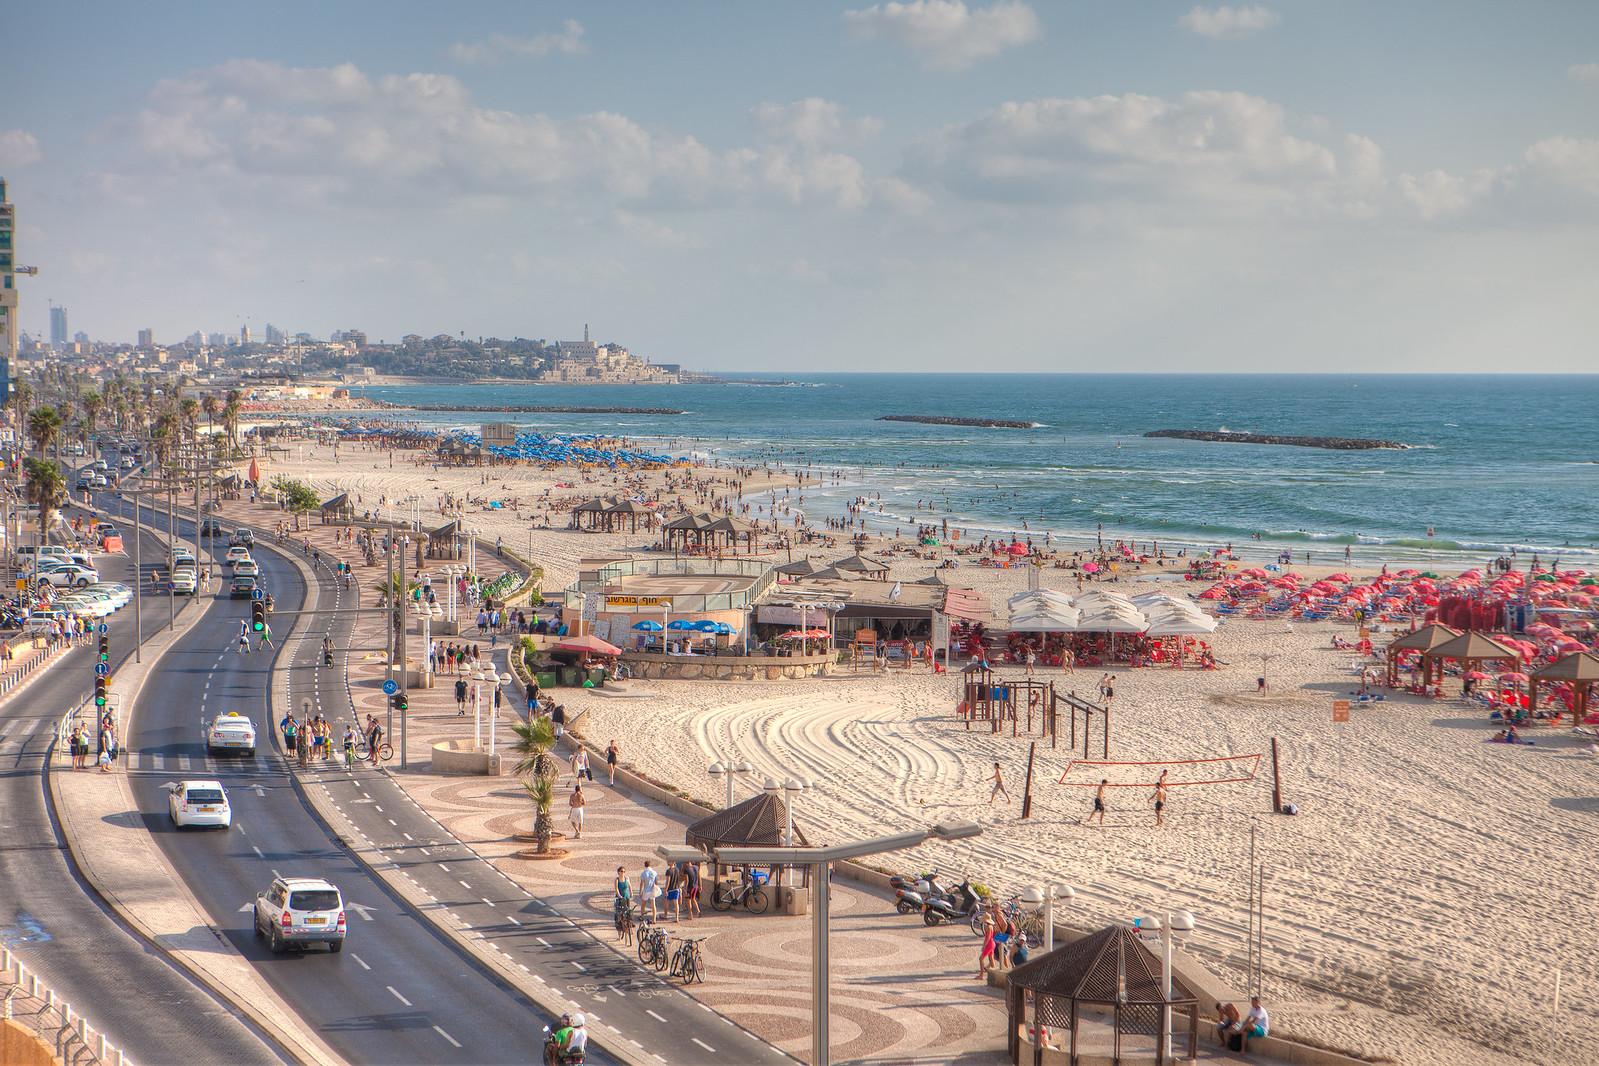 Tel Aviv_Beach_ Promenade_ 2_ Dana Friedlander_IMOT